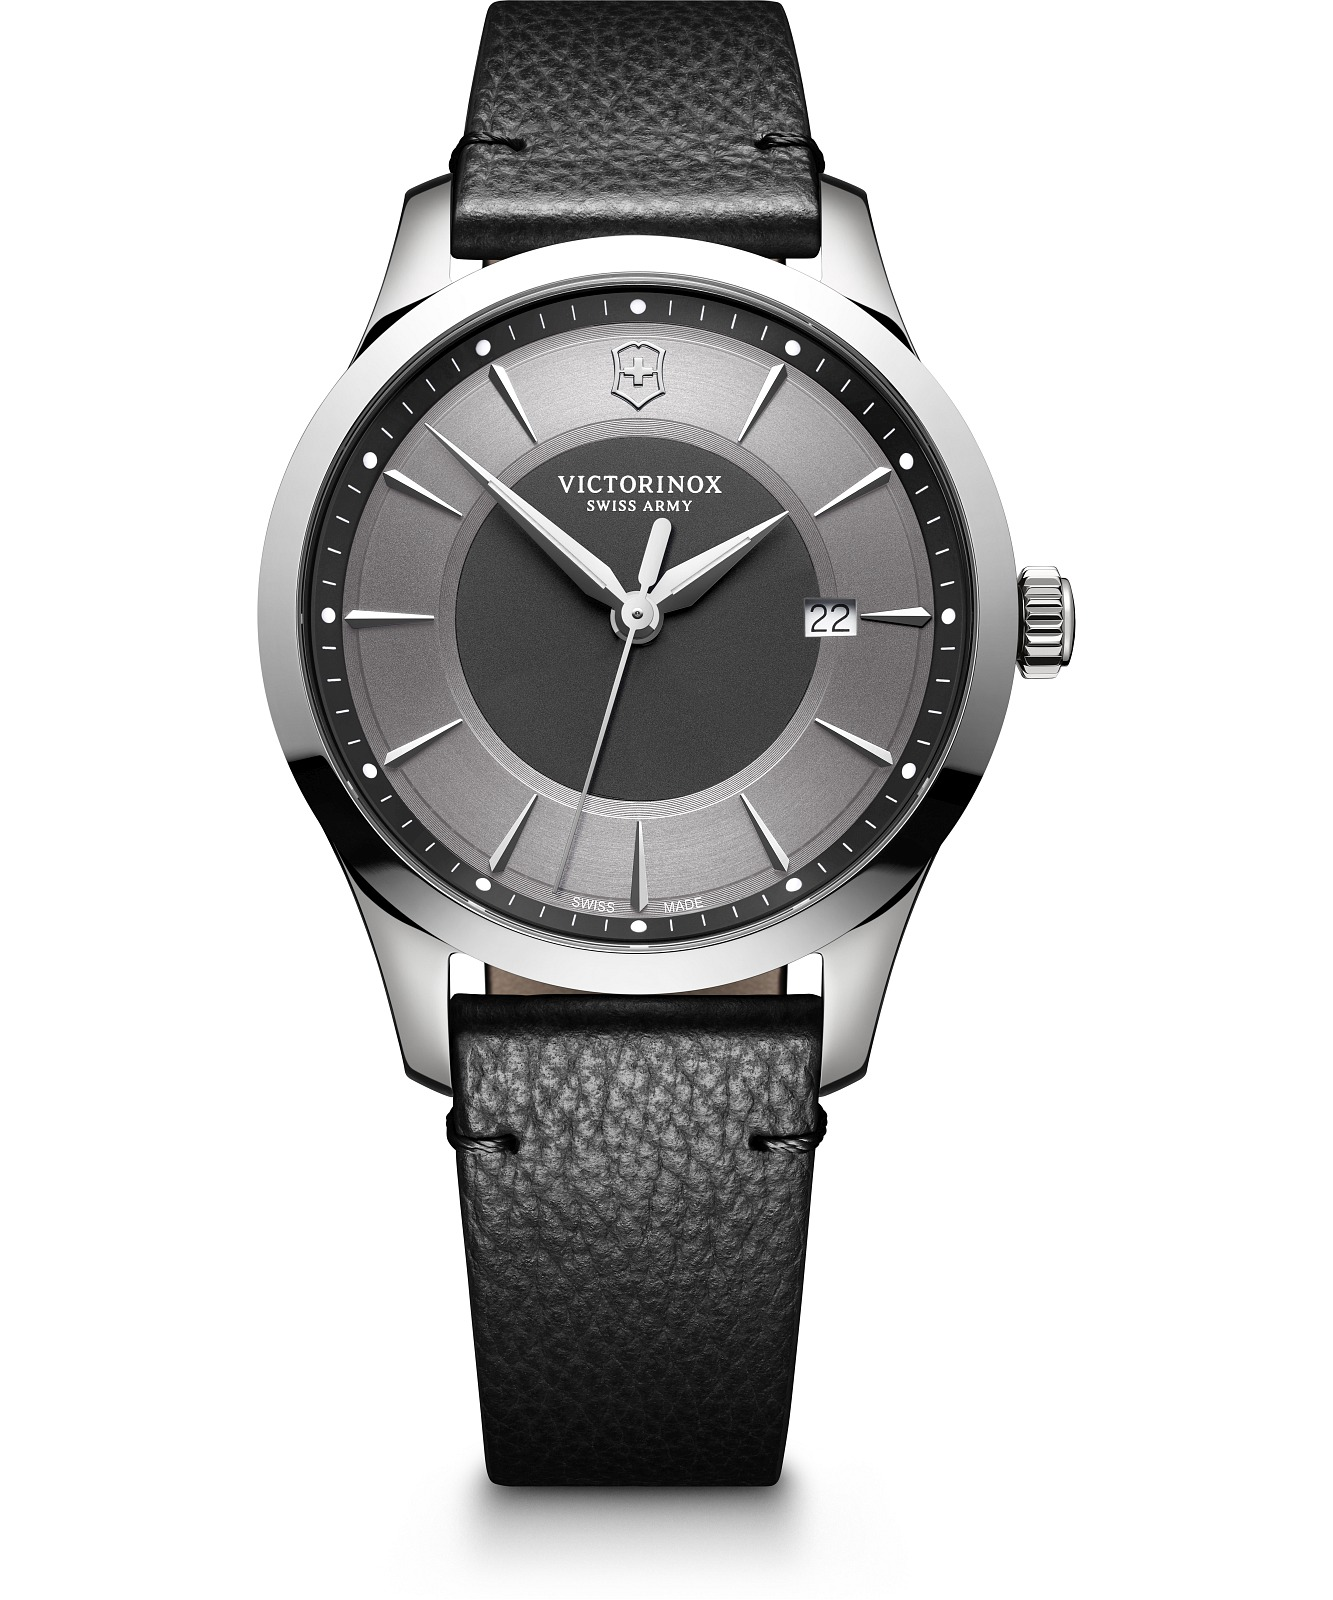 zegarek-meski-victorinox-alliance-gift-set-241804-1_002